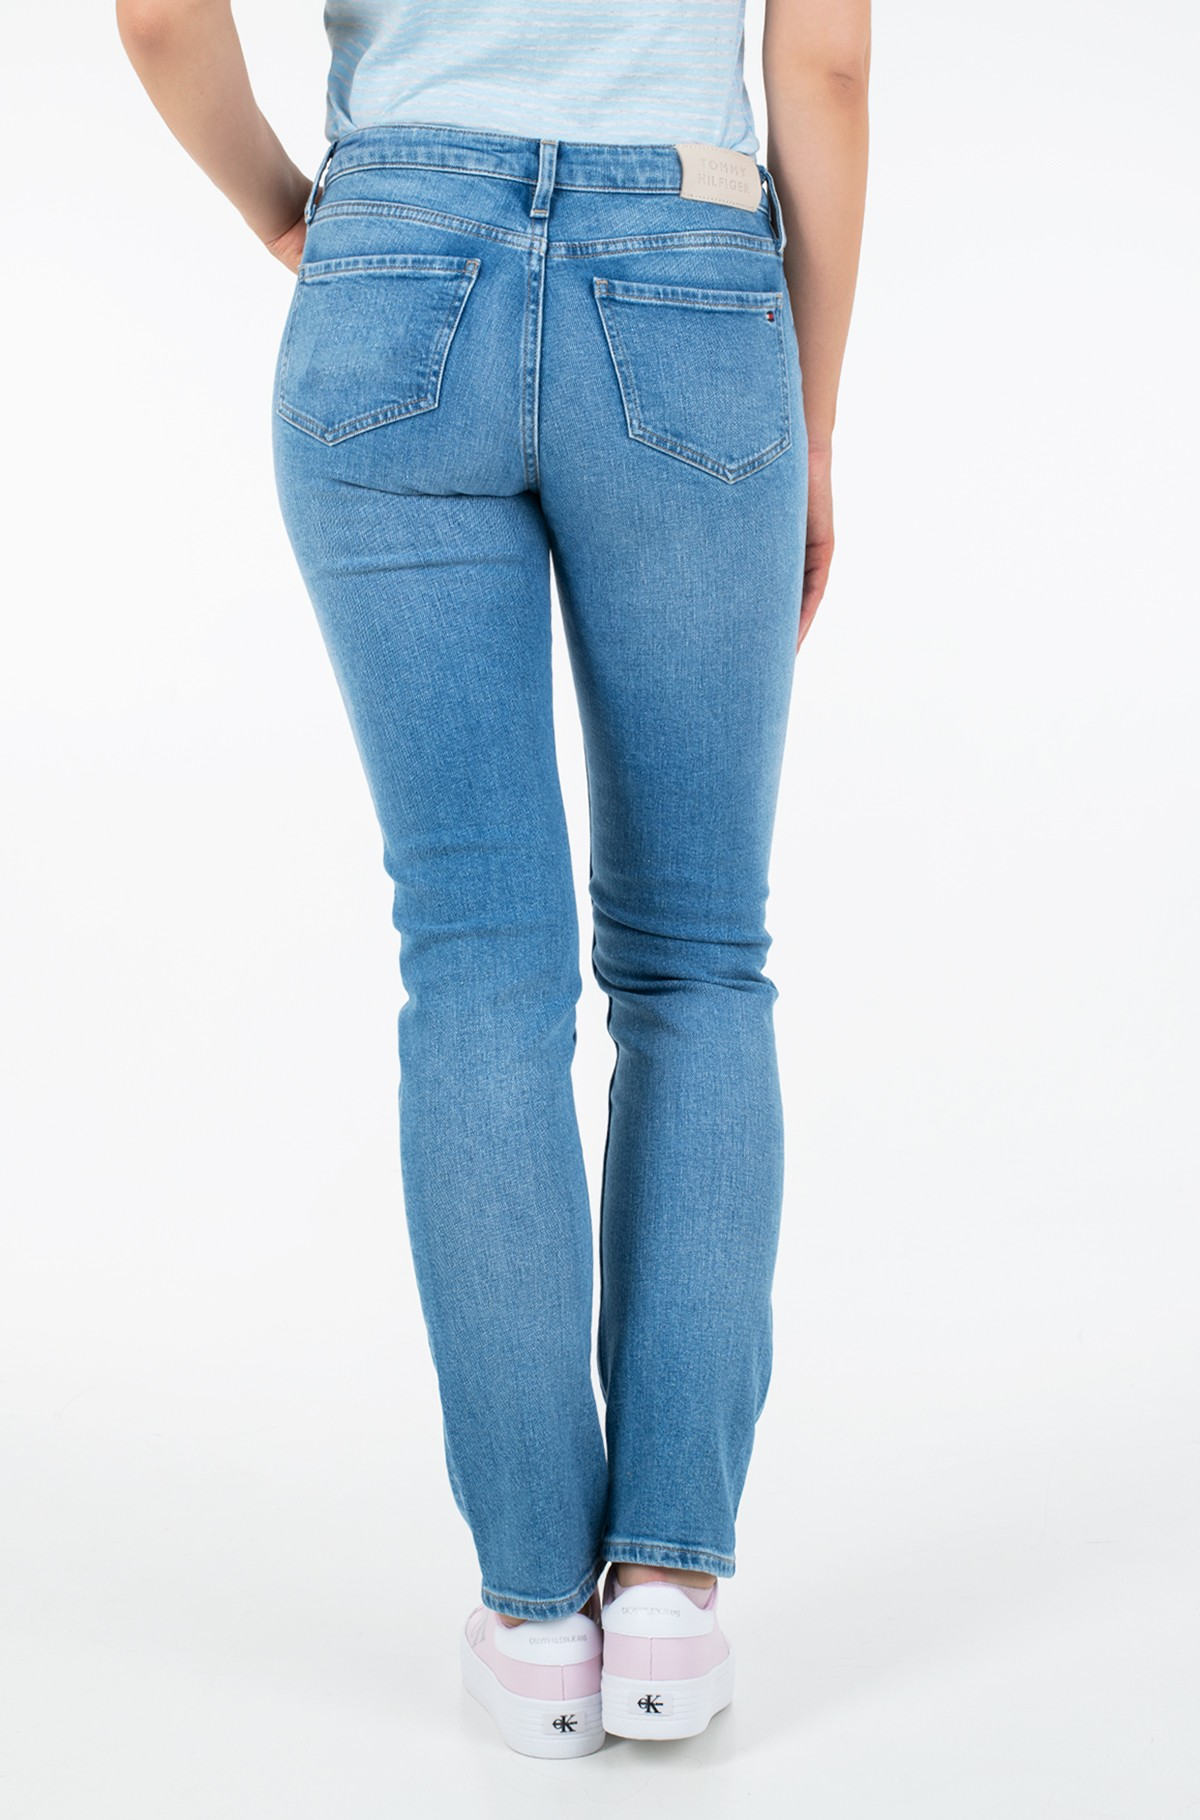 Jeans ROME STRAIGHT RW JUL-full-2